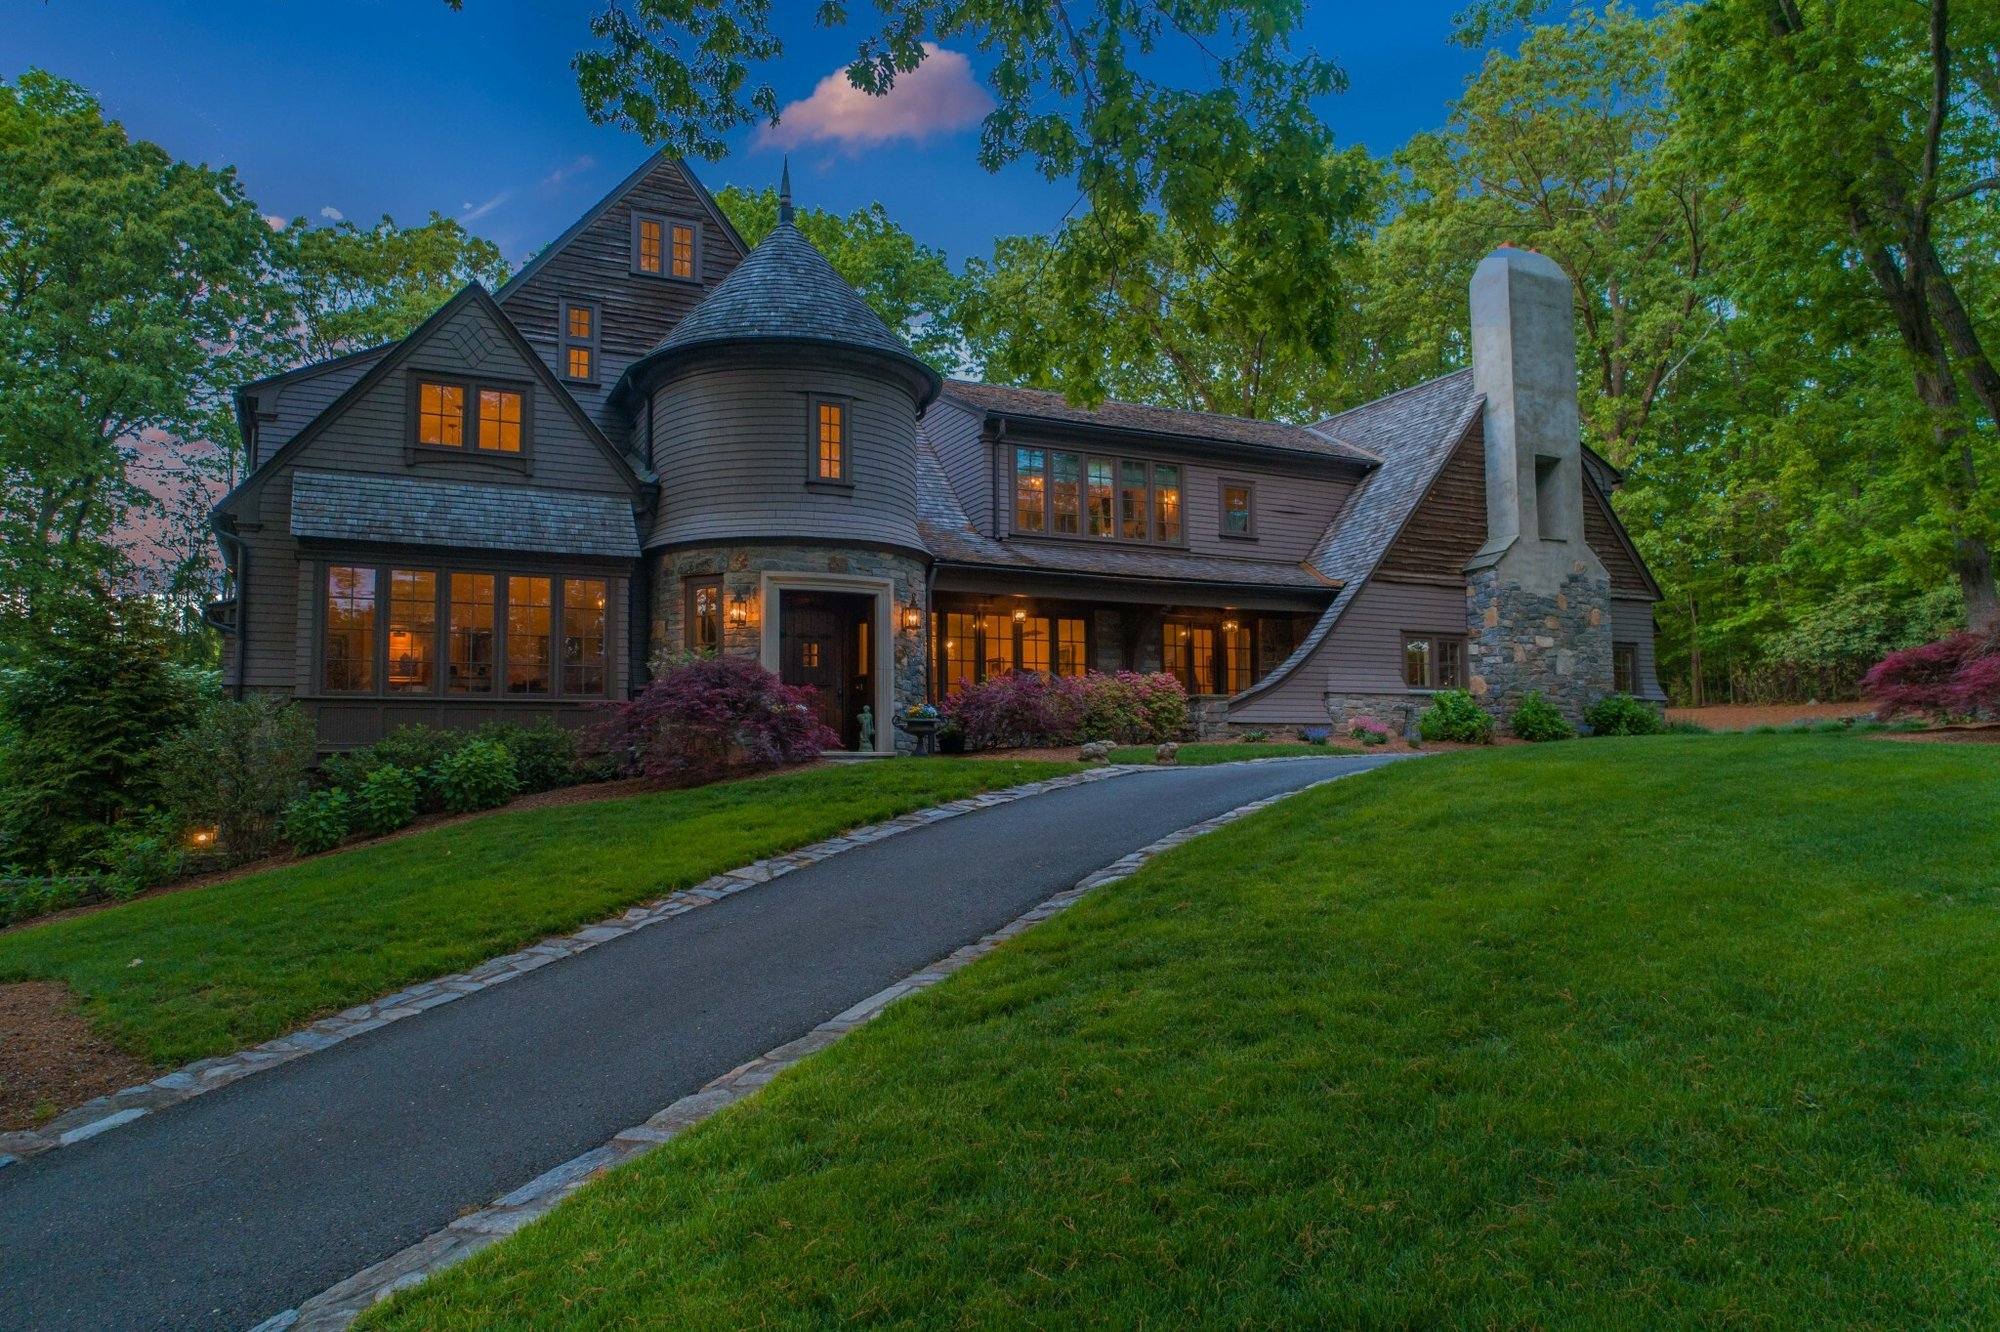 Casa a Ho-Ho-Kus, New Jersey, Stati Uniti 1 - 11376634